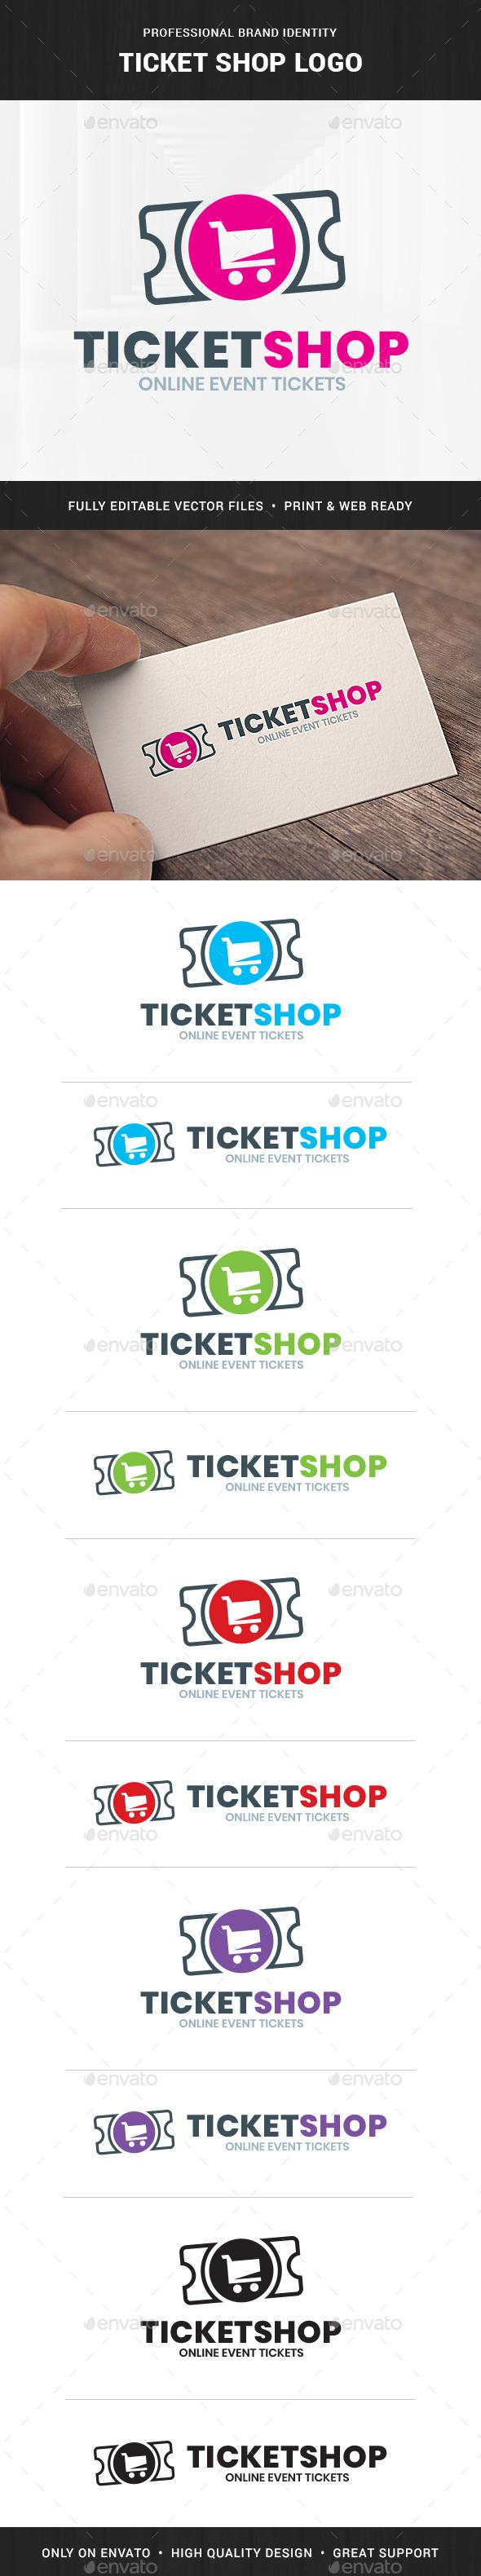 Ticket Shop Logo Template - Symbols Logo Templates